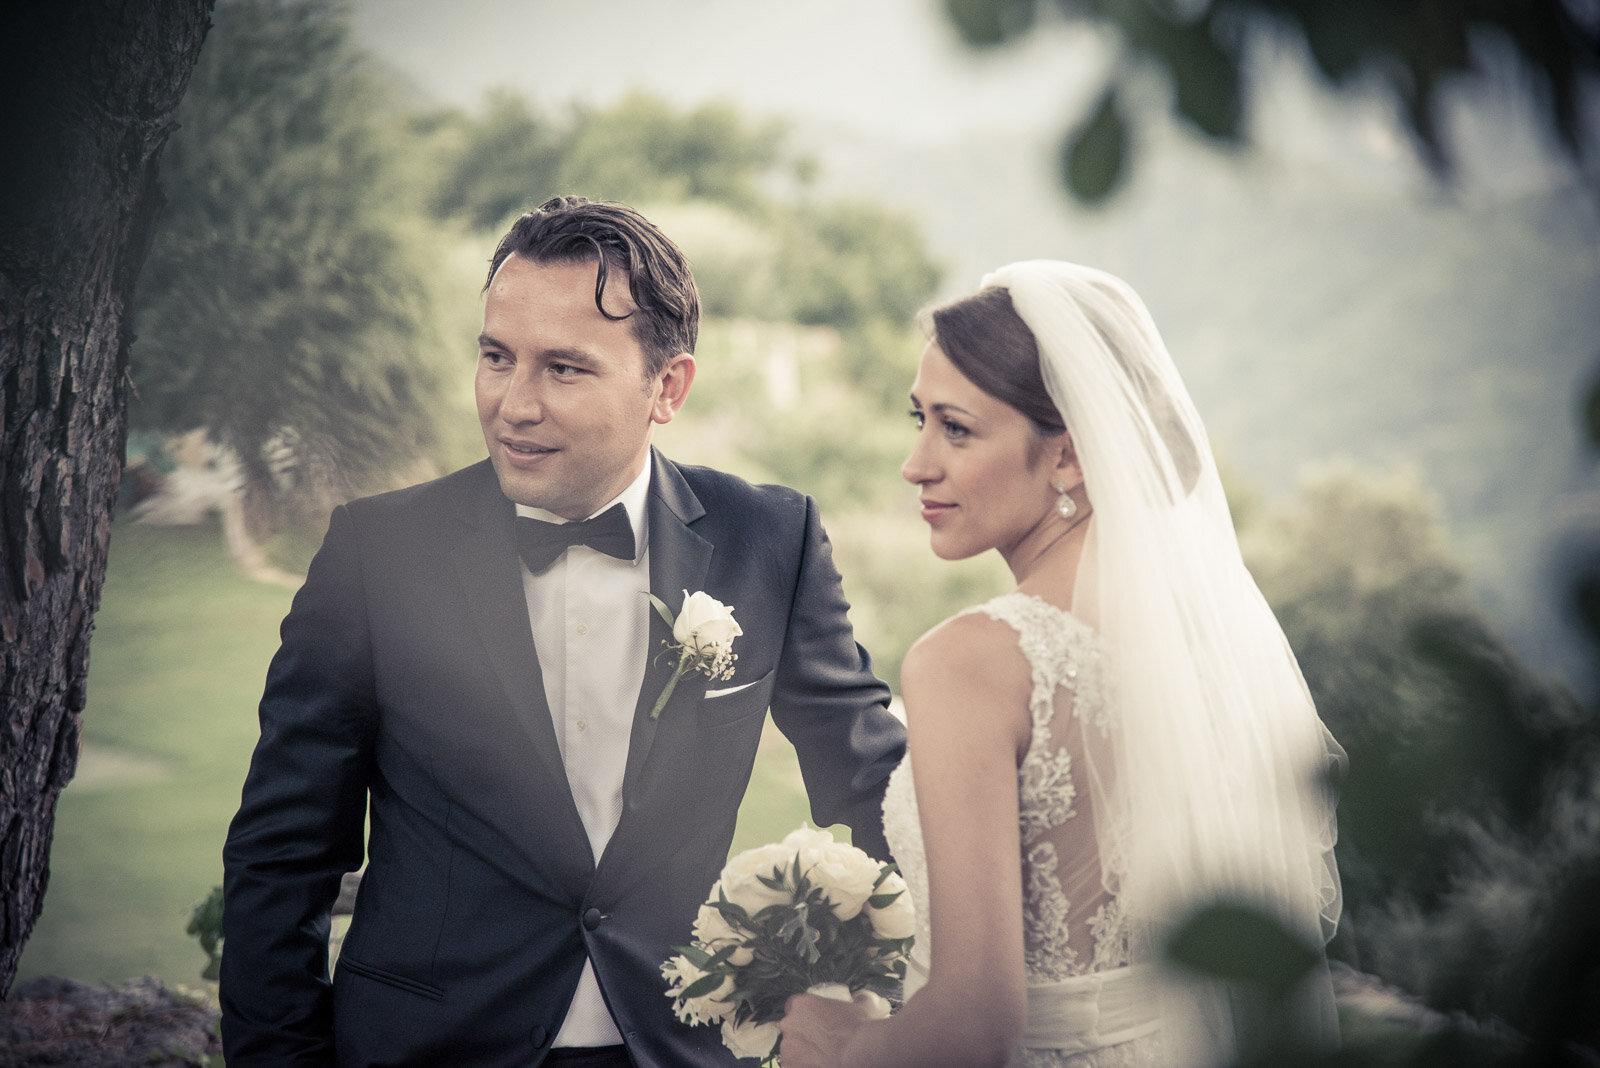 Russian Wedding in Villa Cimbrone Costiera Amalfitana 26.jpg